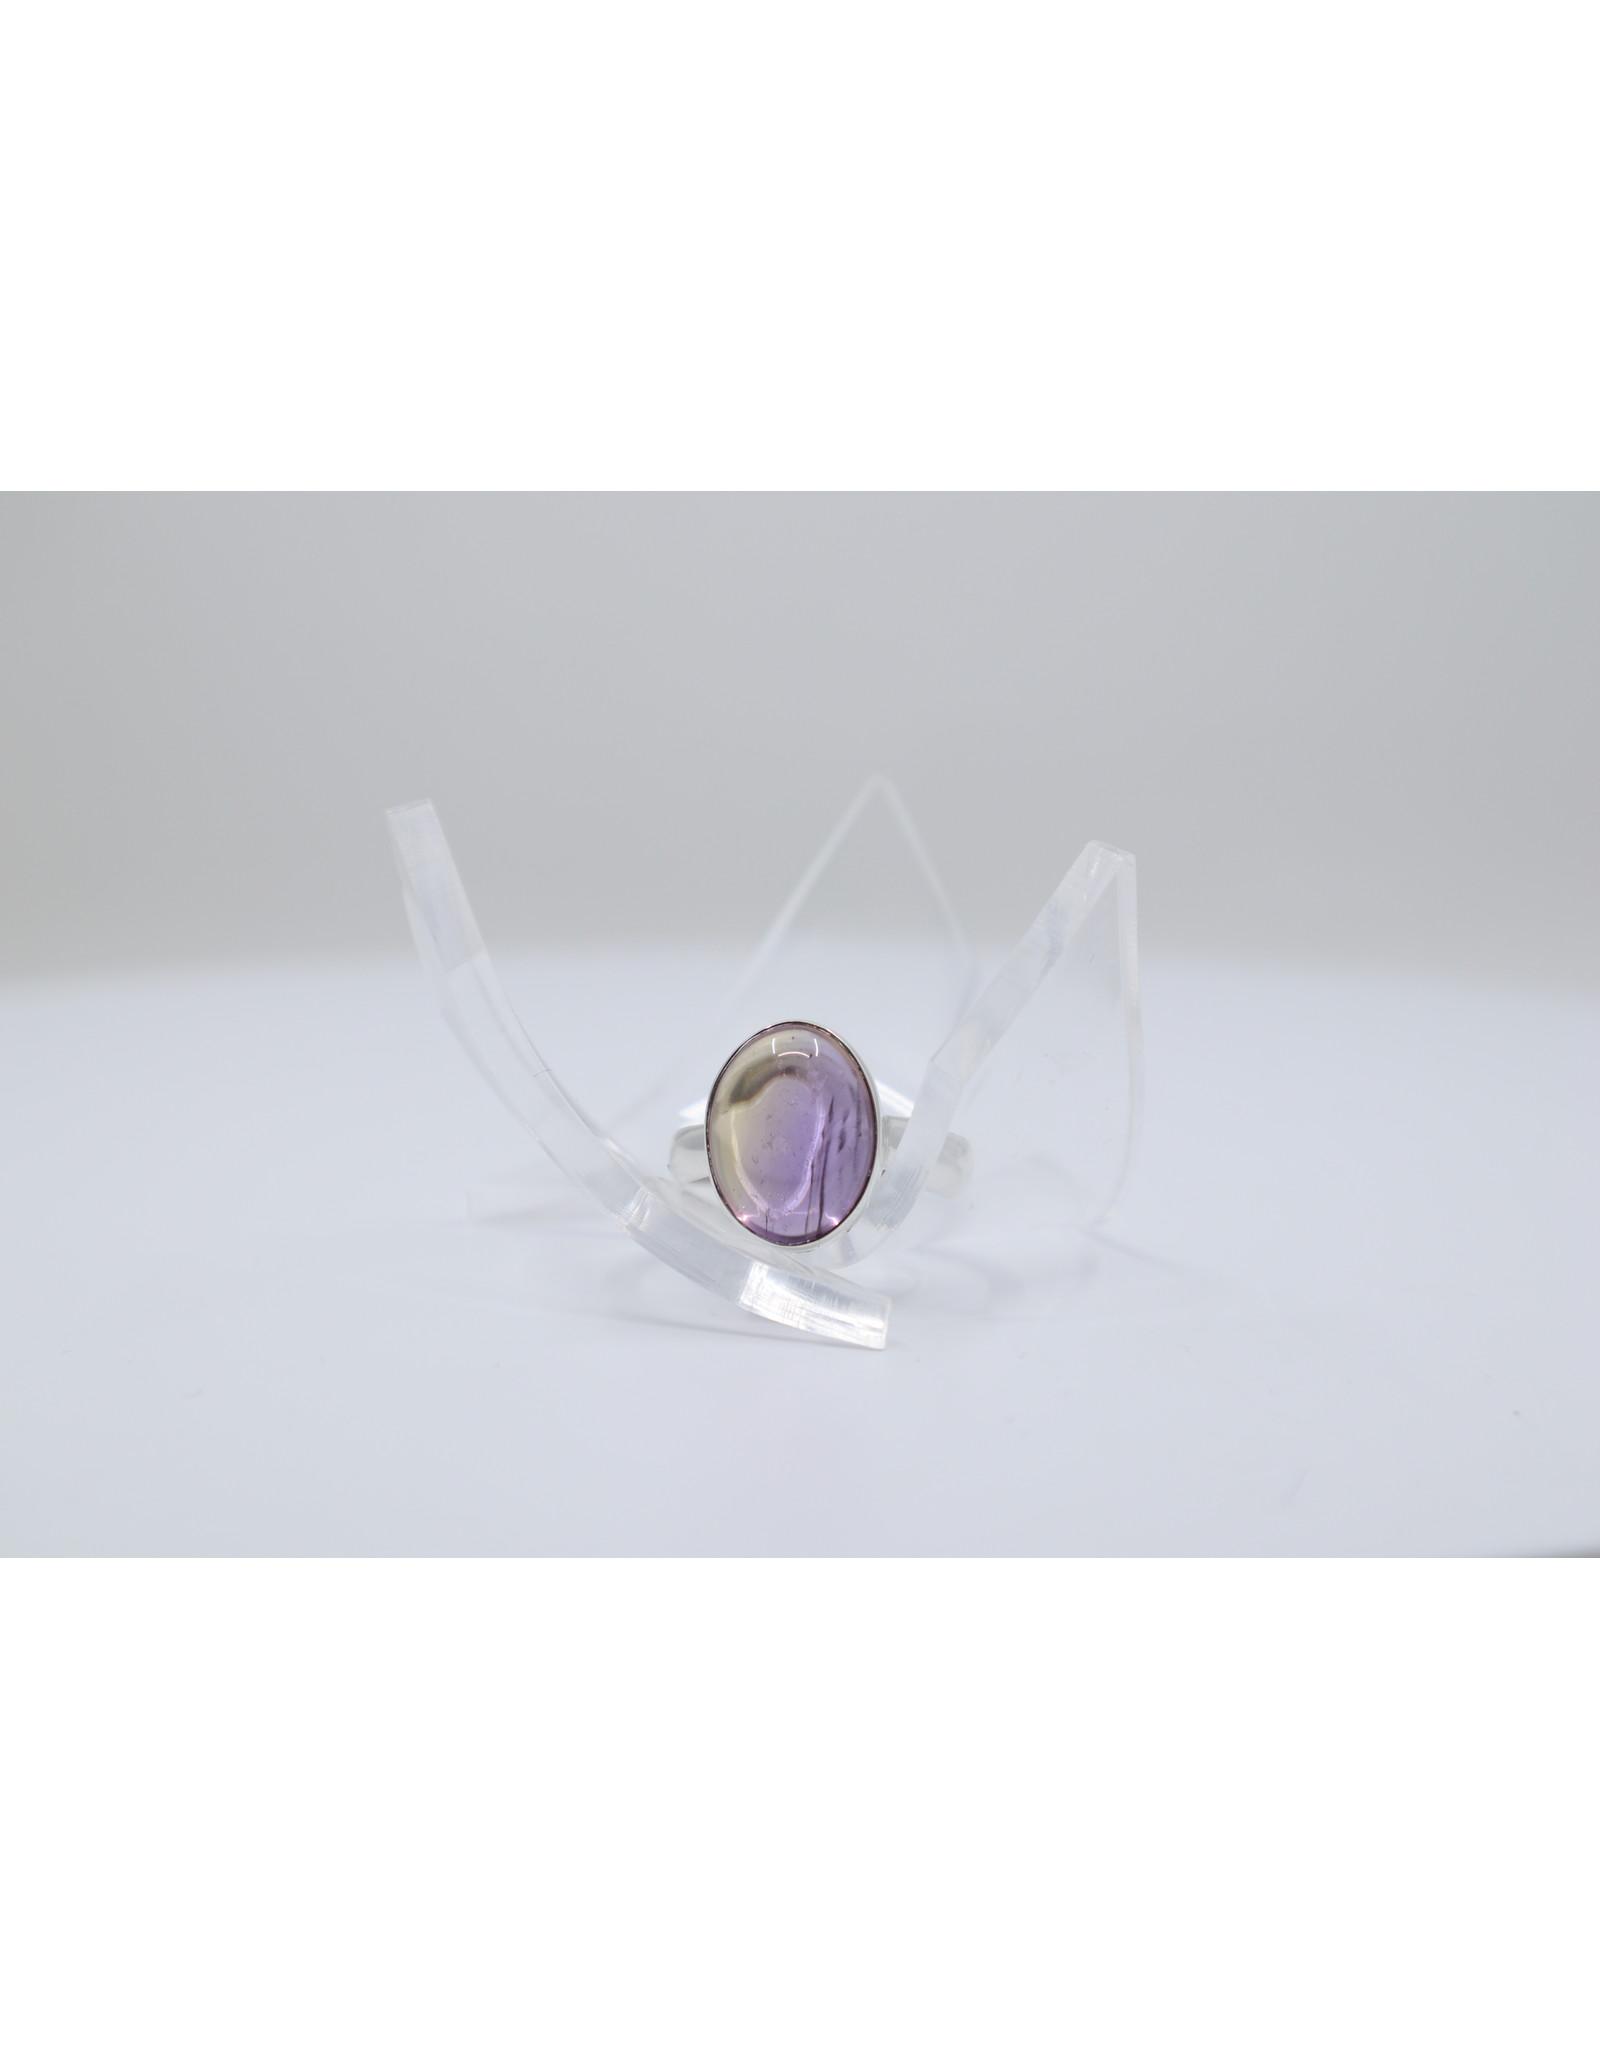 Bolivian Ametrine Ring - 6